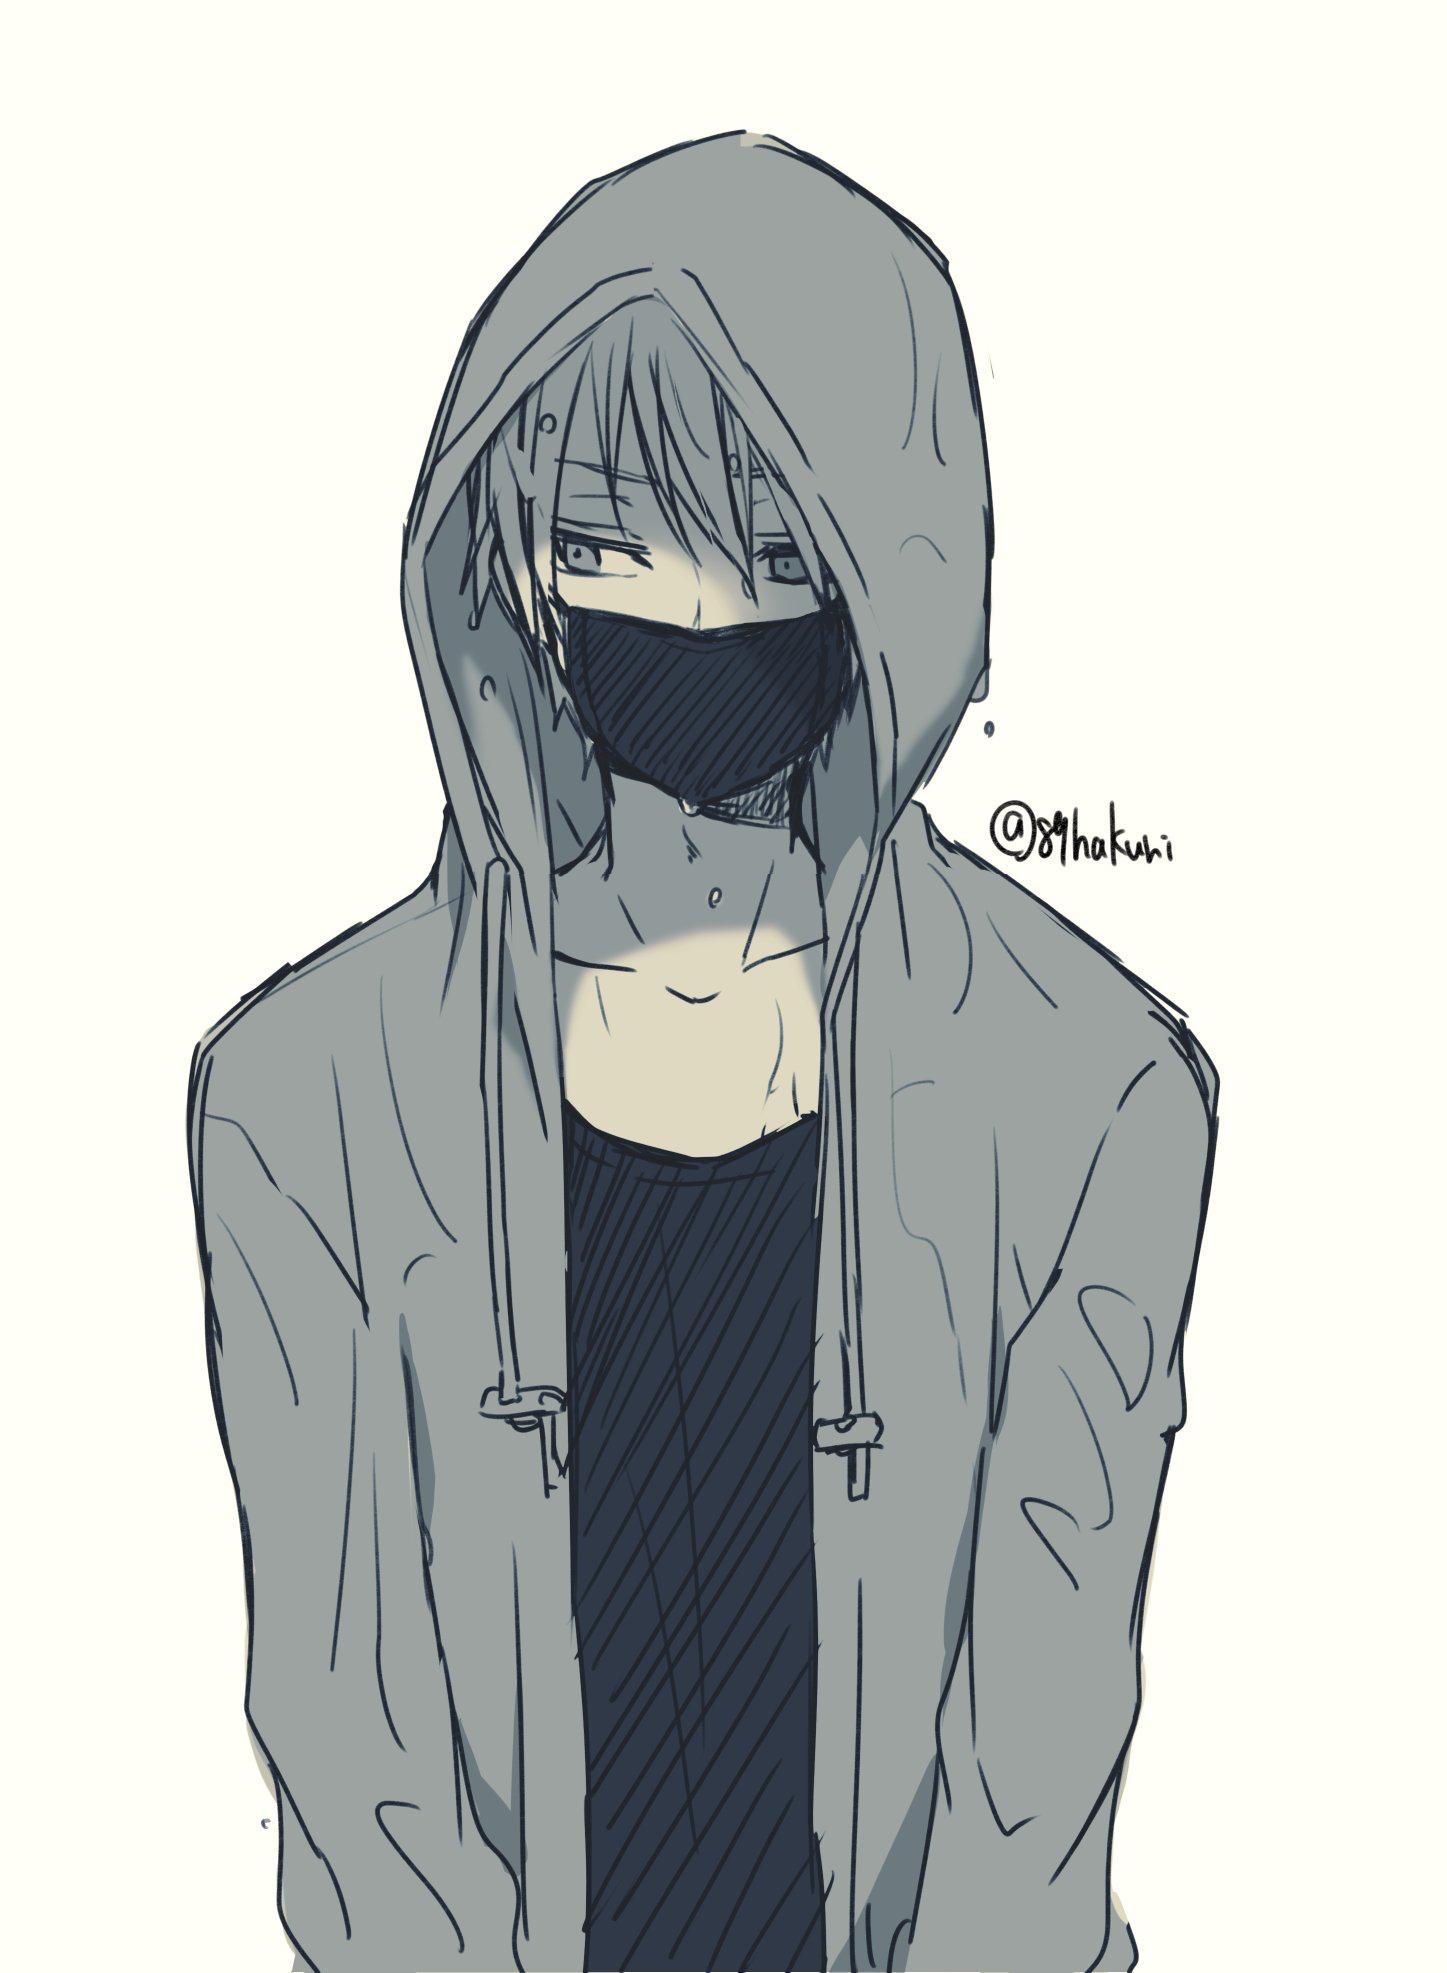 Knowed Cute Anime Guys Anime Anime Boy